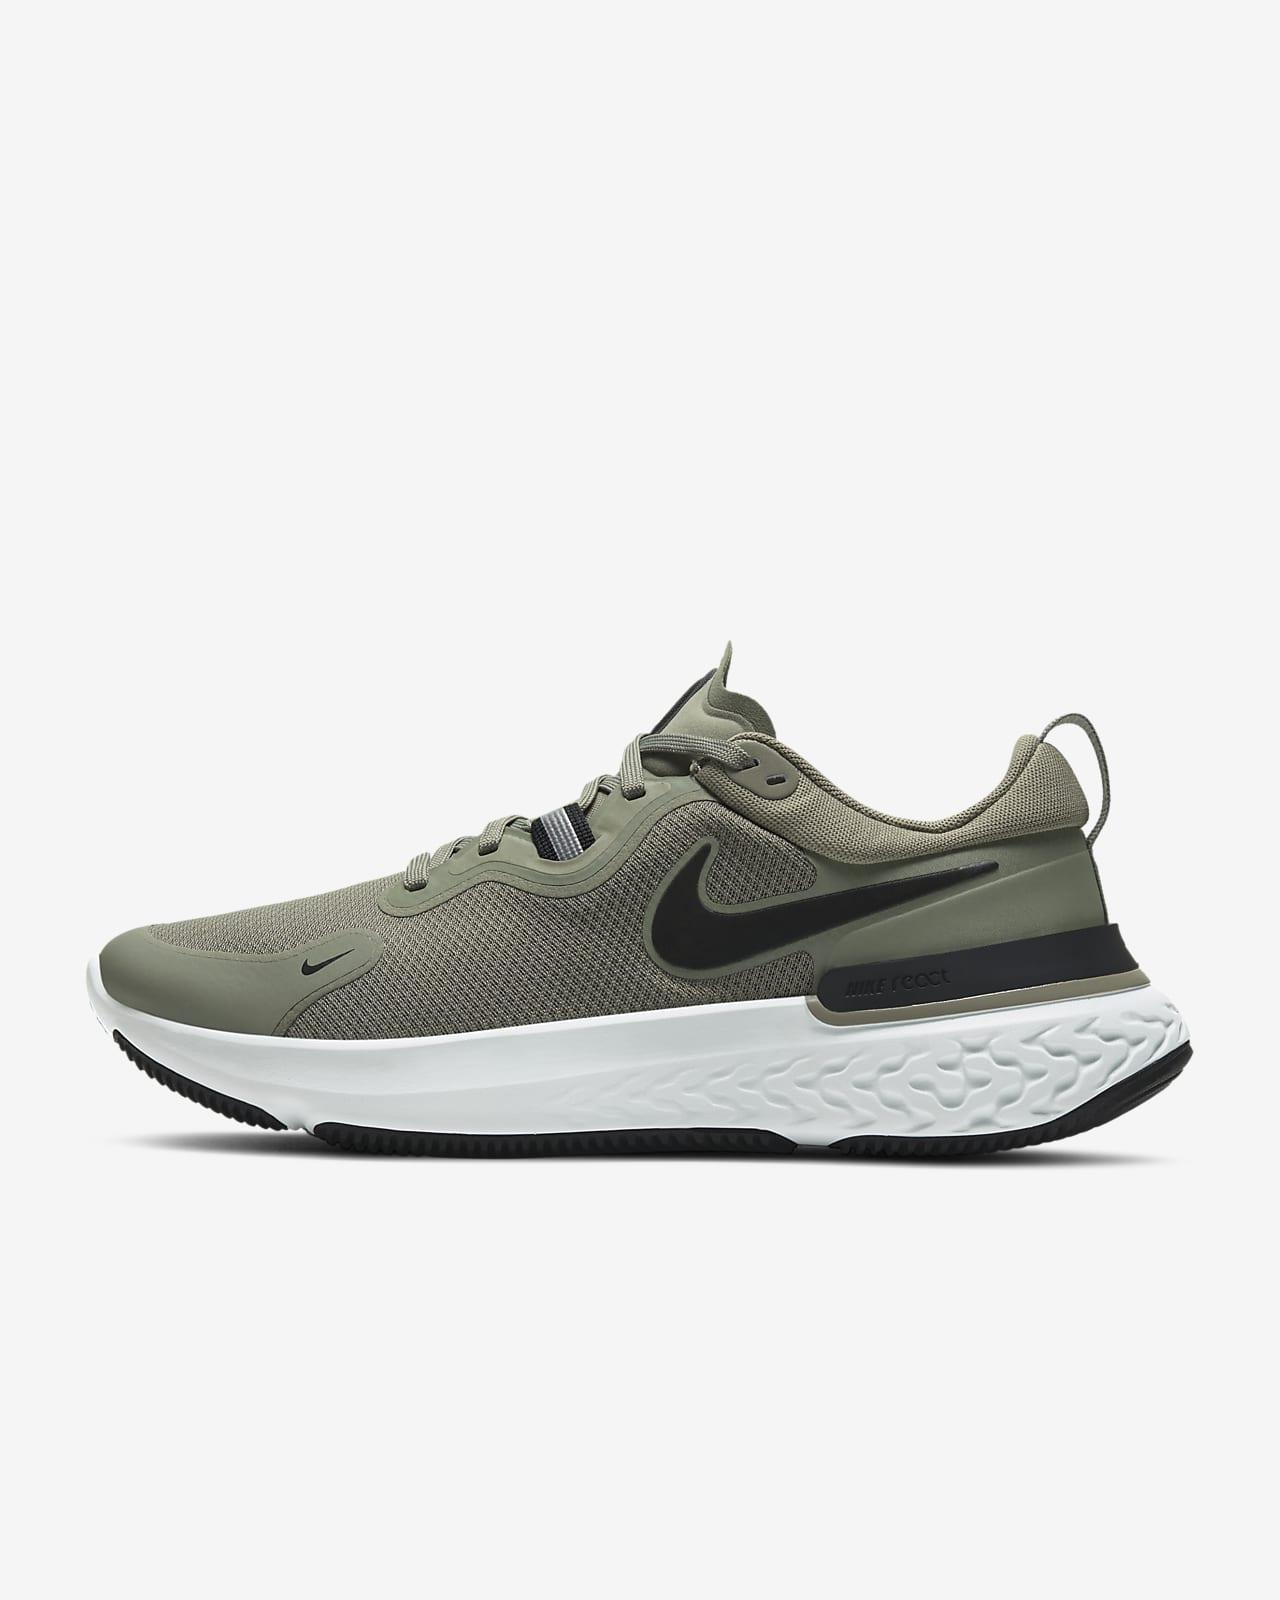 Calzado de running para carretera para hombre Nike React Miler